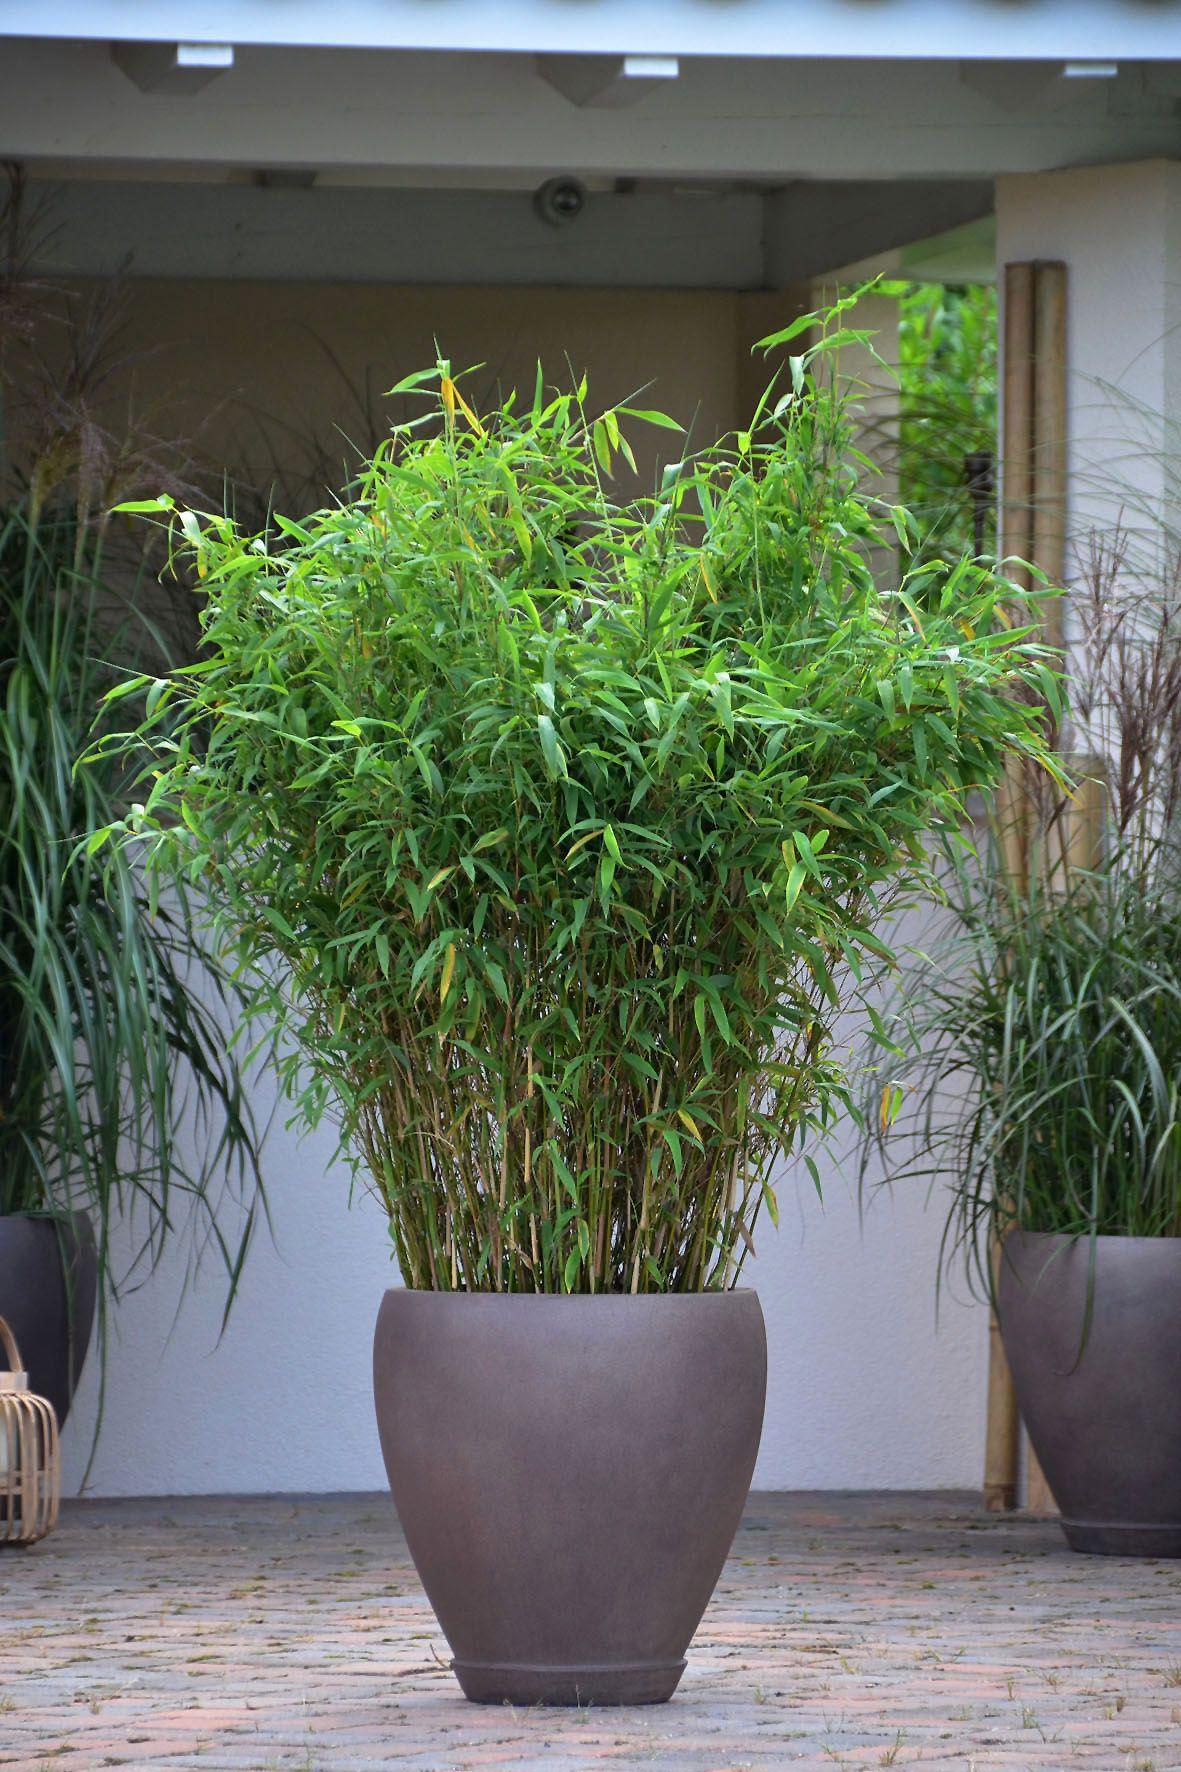 bambus im k bel da ger t er nicht so au er kontrolle mehr garten garden garden plants. Black Bedroom Furniture Sets. Home Design Ideas